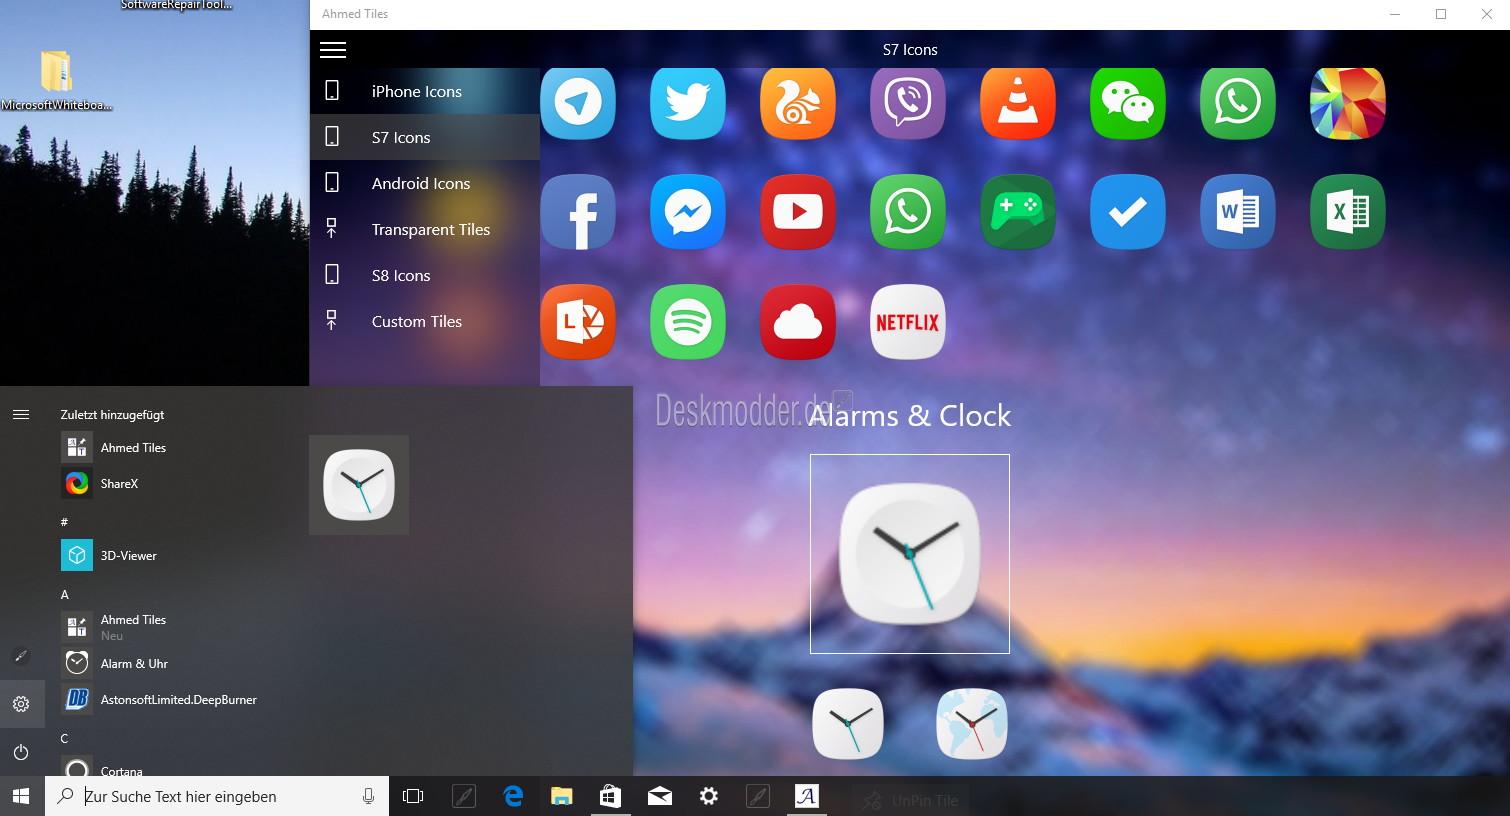 custom icons windows 10 - Monza berglauf-verband com